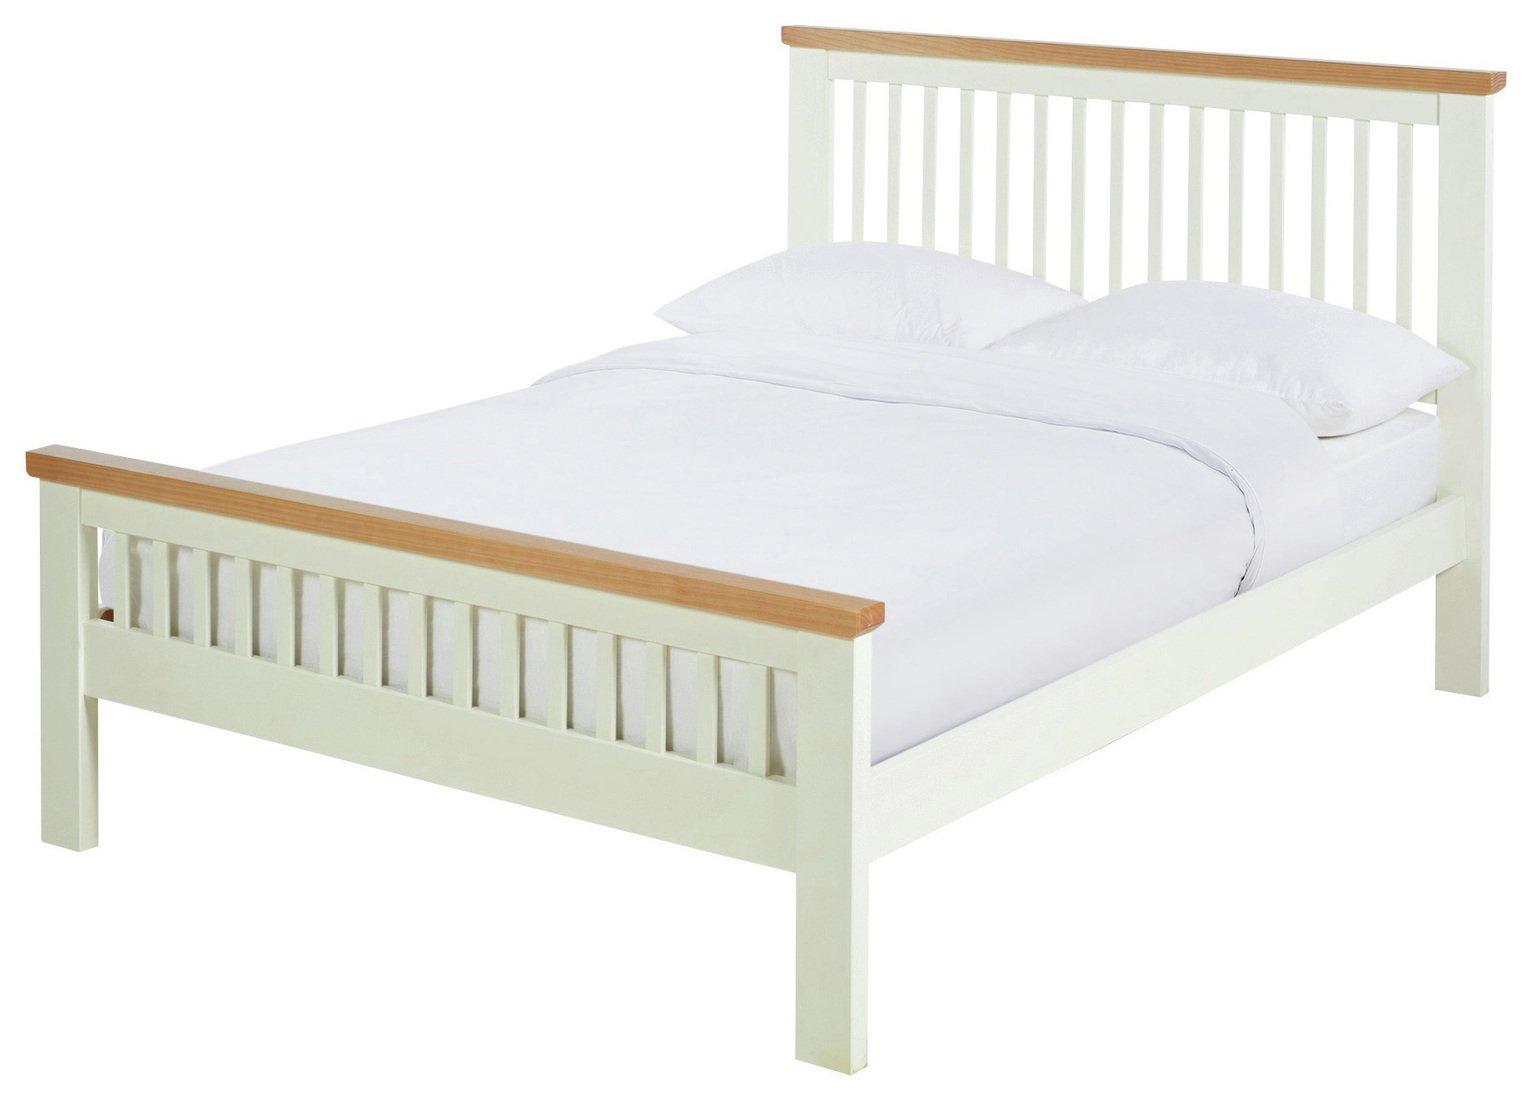 Argos Home Aubrey Double Bed Frame - Two Tone